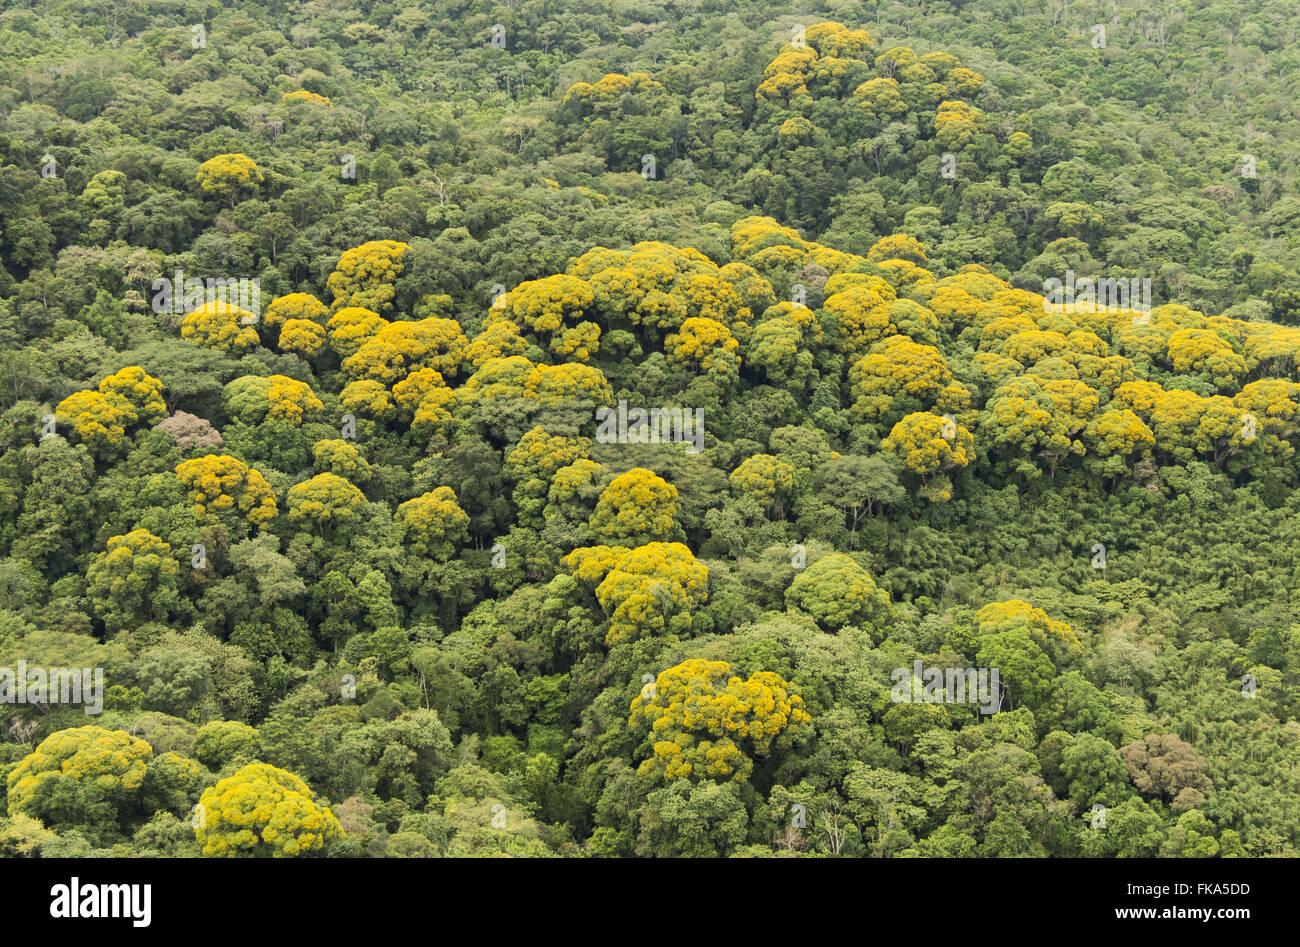 Flowering acacias in the Atlantic Forest - Ecological Station Jureia-Itatins - Stock Image